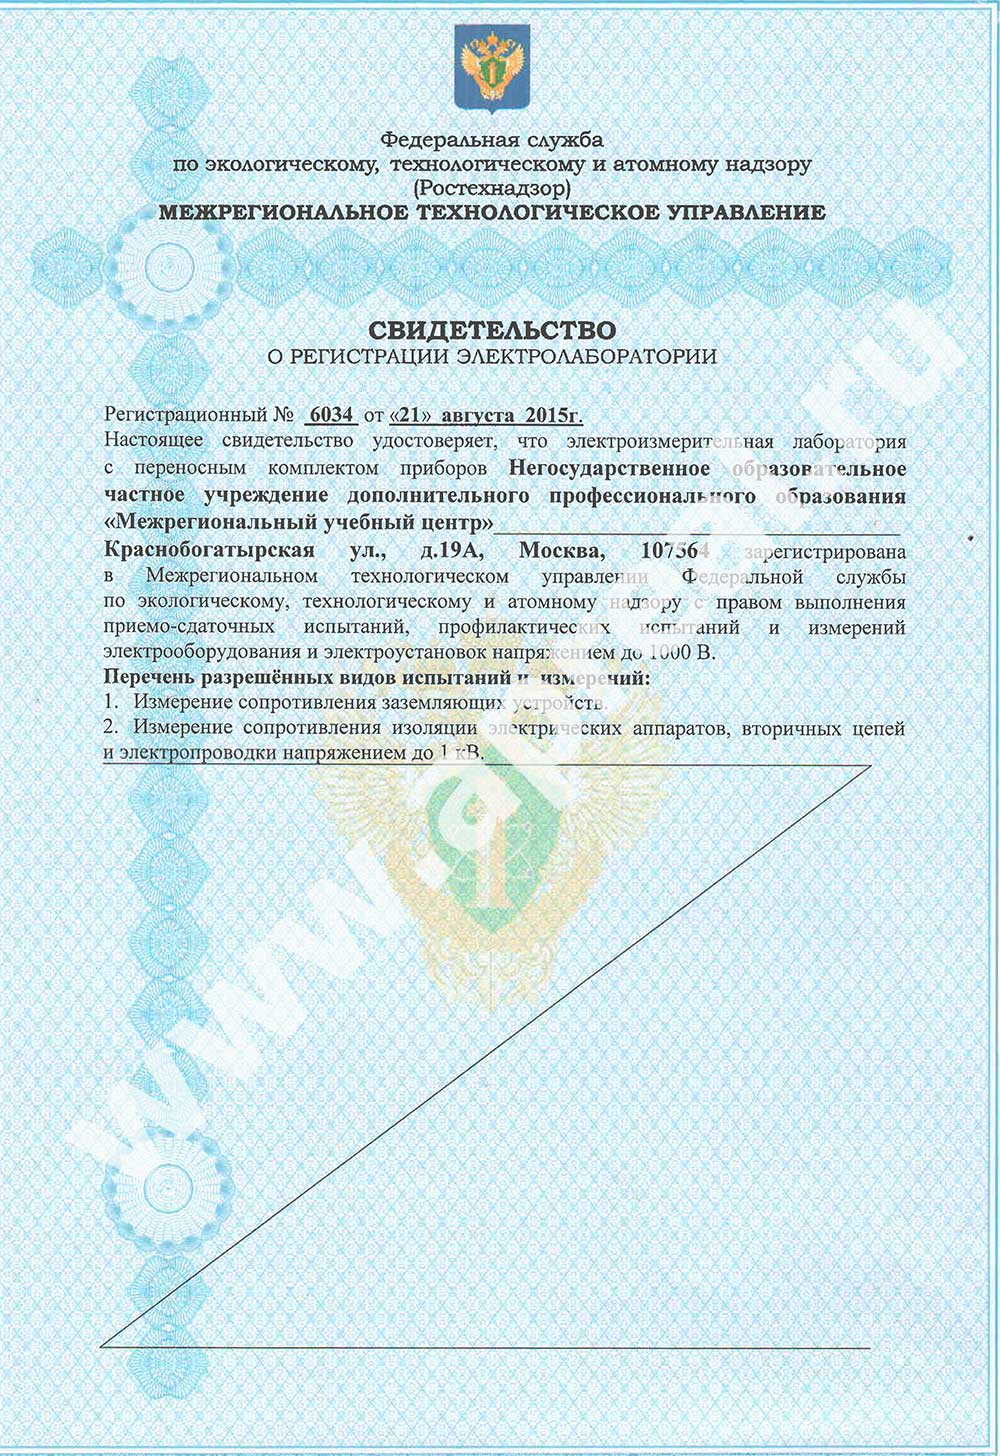 Регистрация электролаборатории НОЧУ ДПО МУЦ